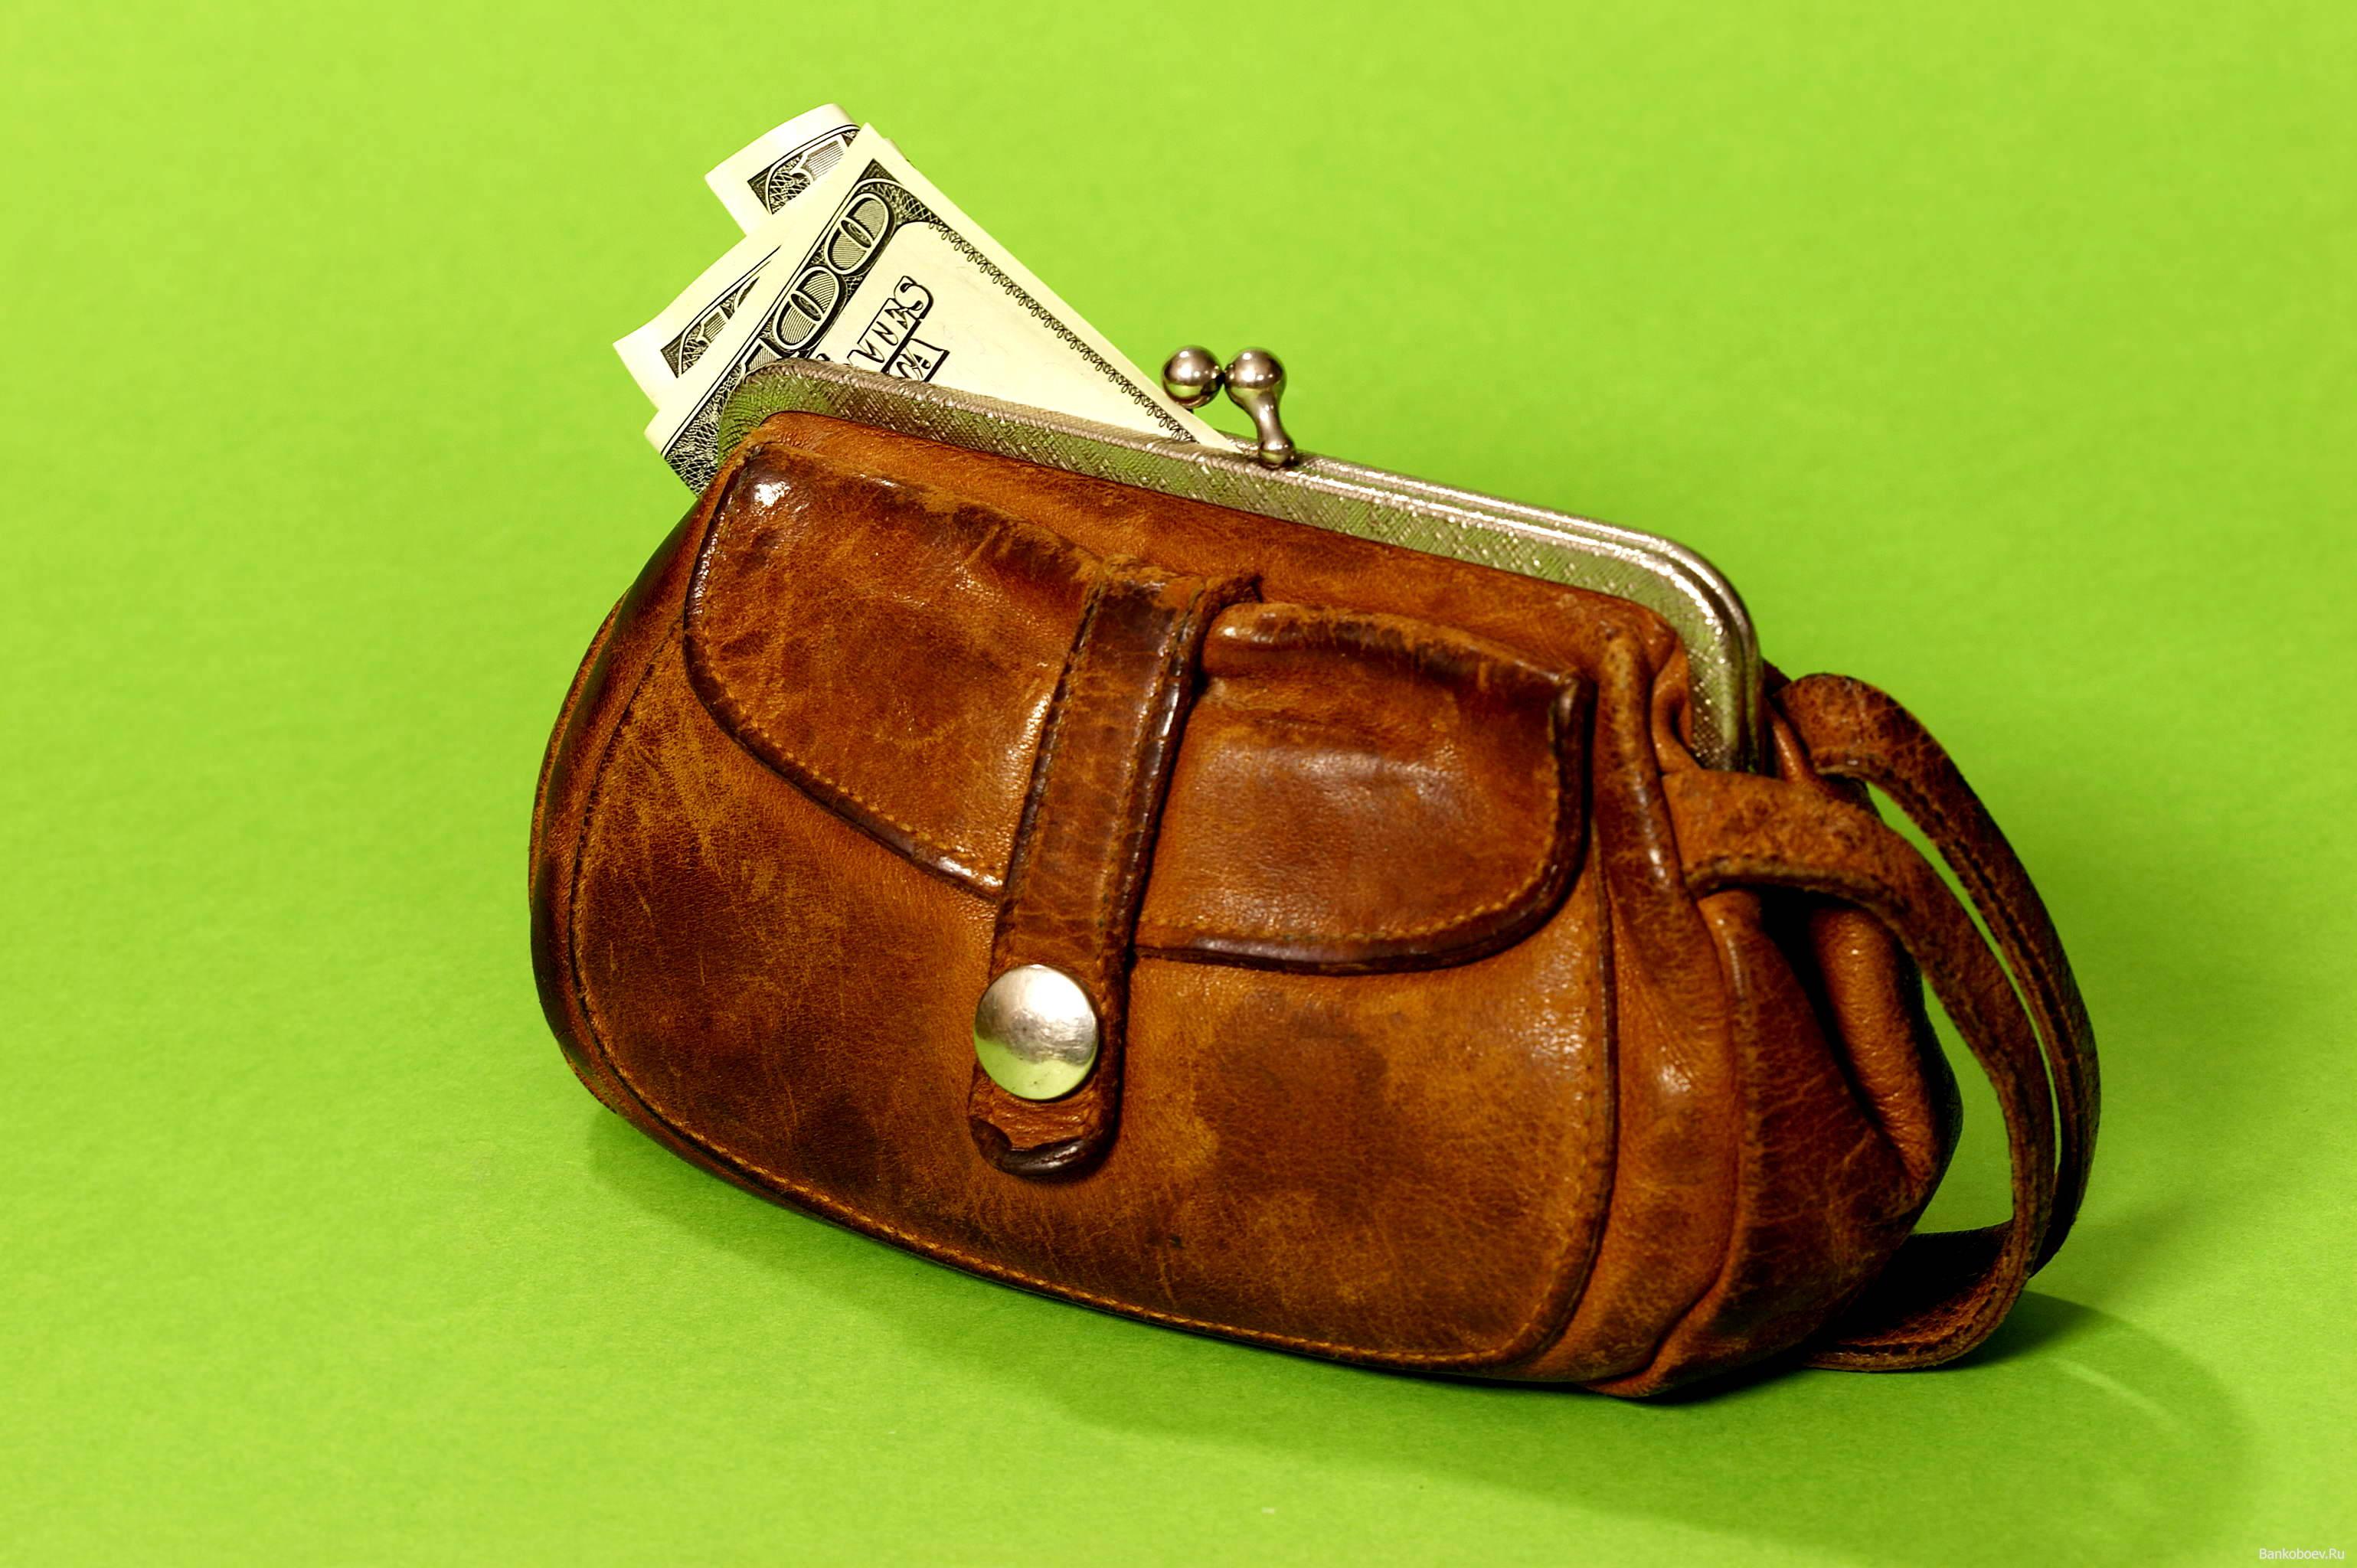 кошелек, доллары, обои на рабочий стол